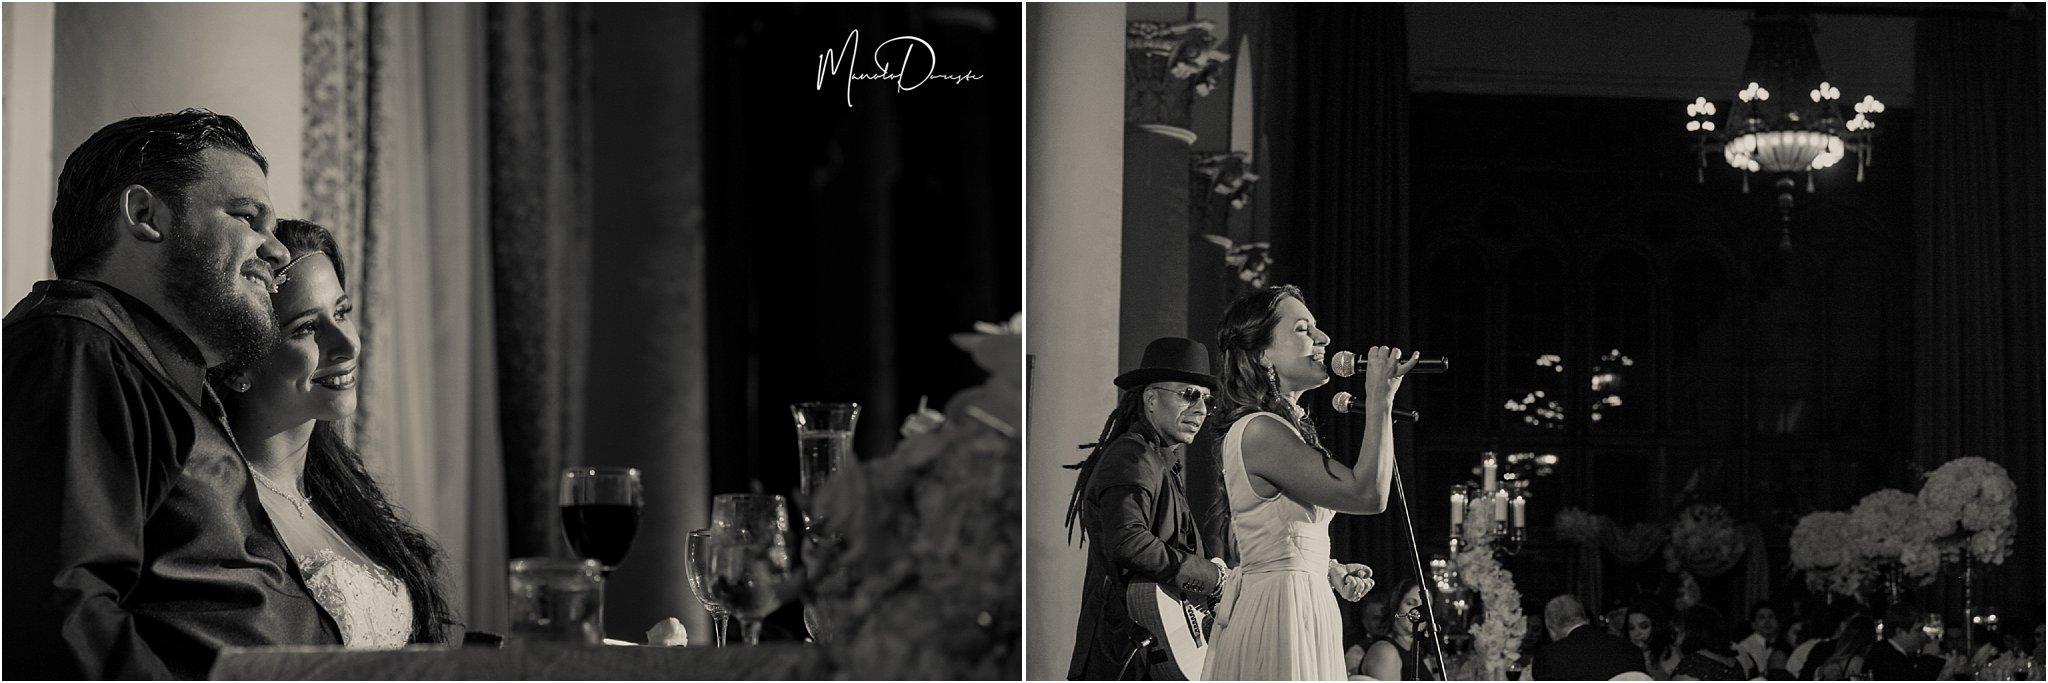 0171_ManoloDoreste_InFocusStudios_Wedding_Family_Photography_Miami_MiamiPhotographer.jpg